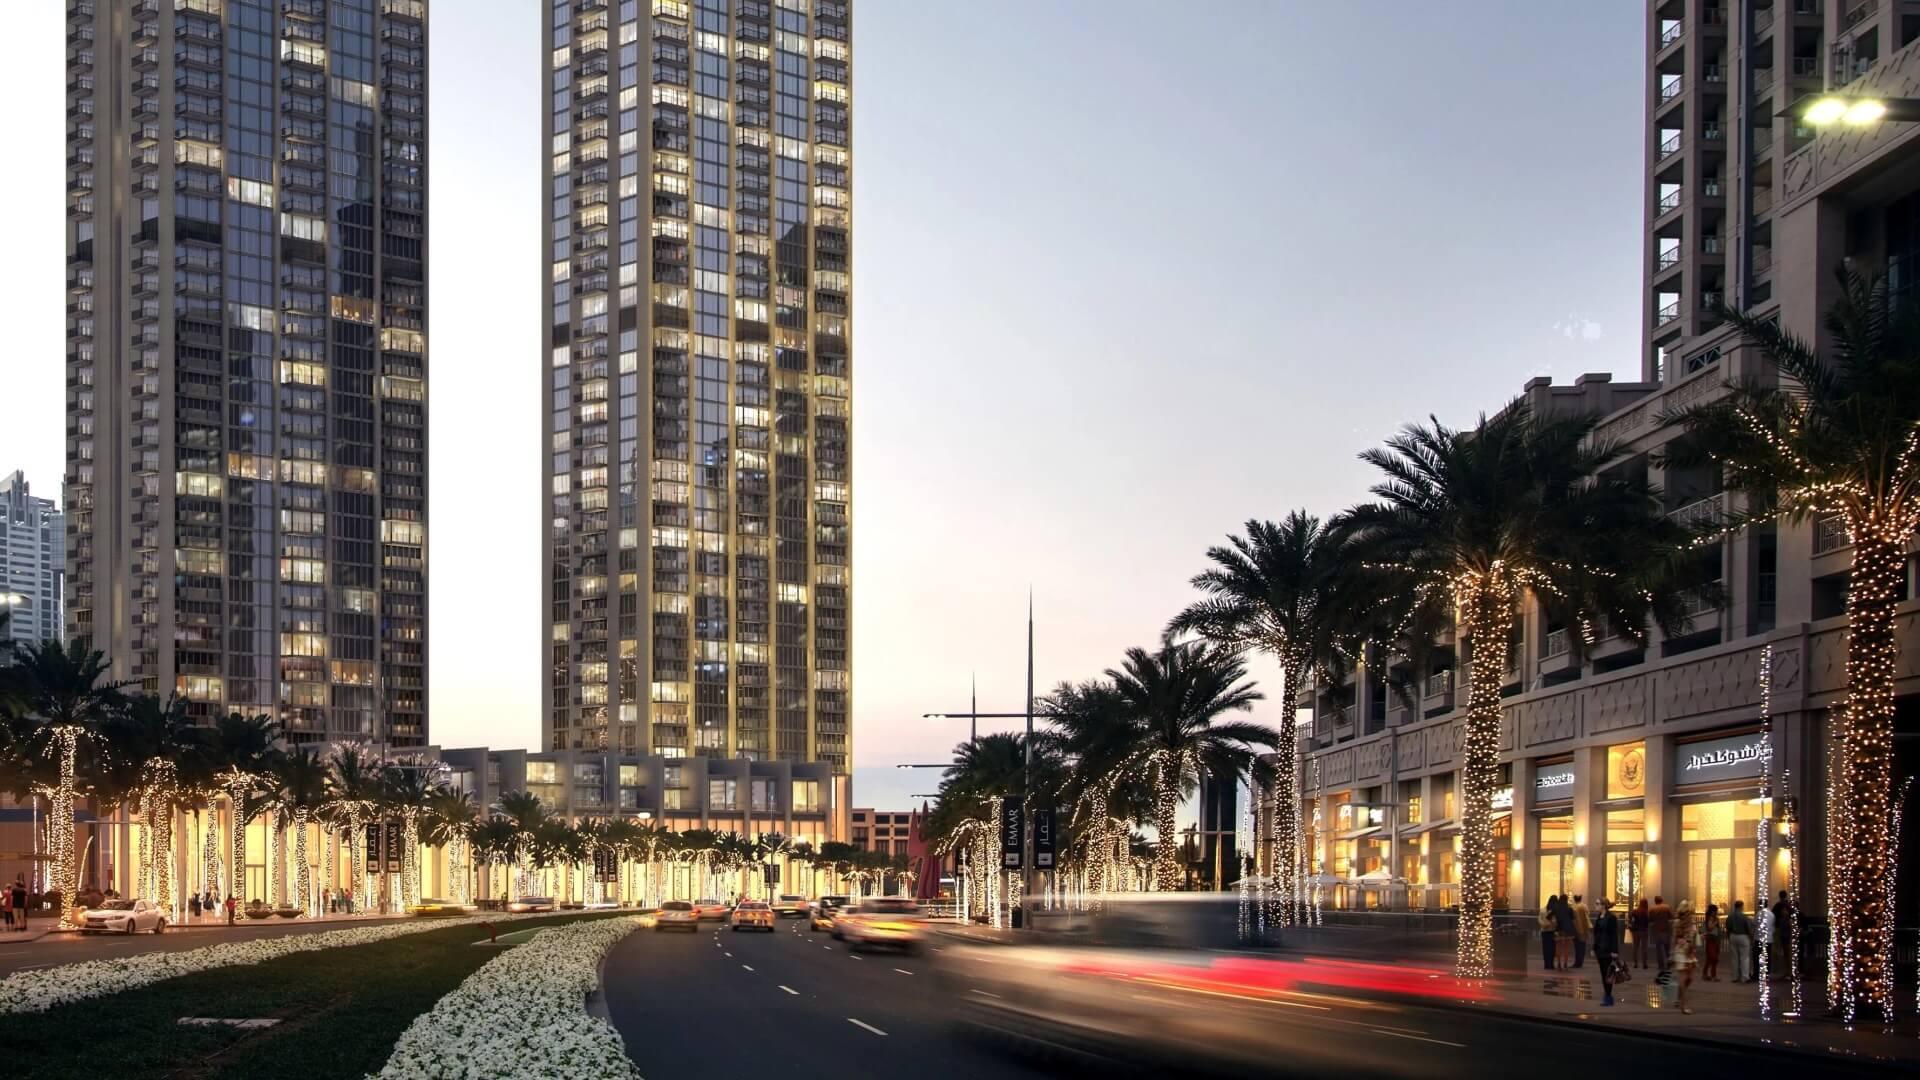 BLVD CRESCENT, Downtown Dubai, UAE – photo 4